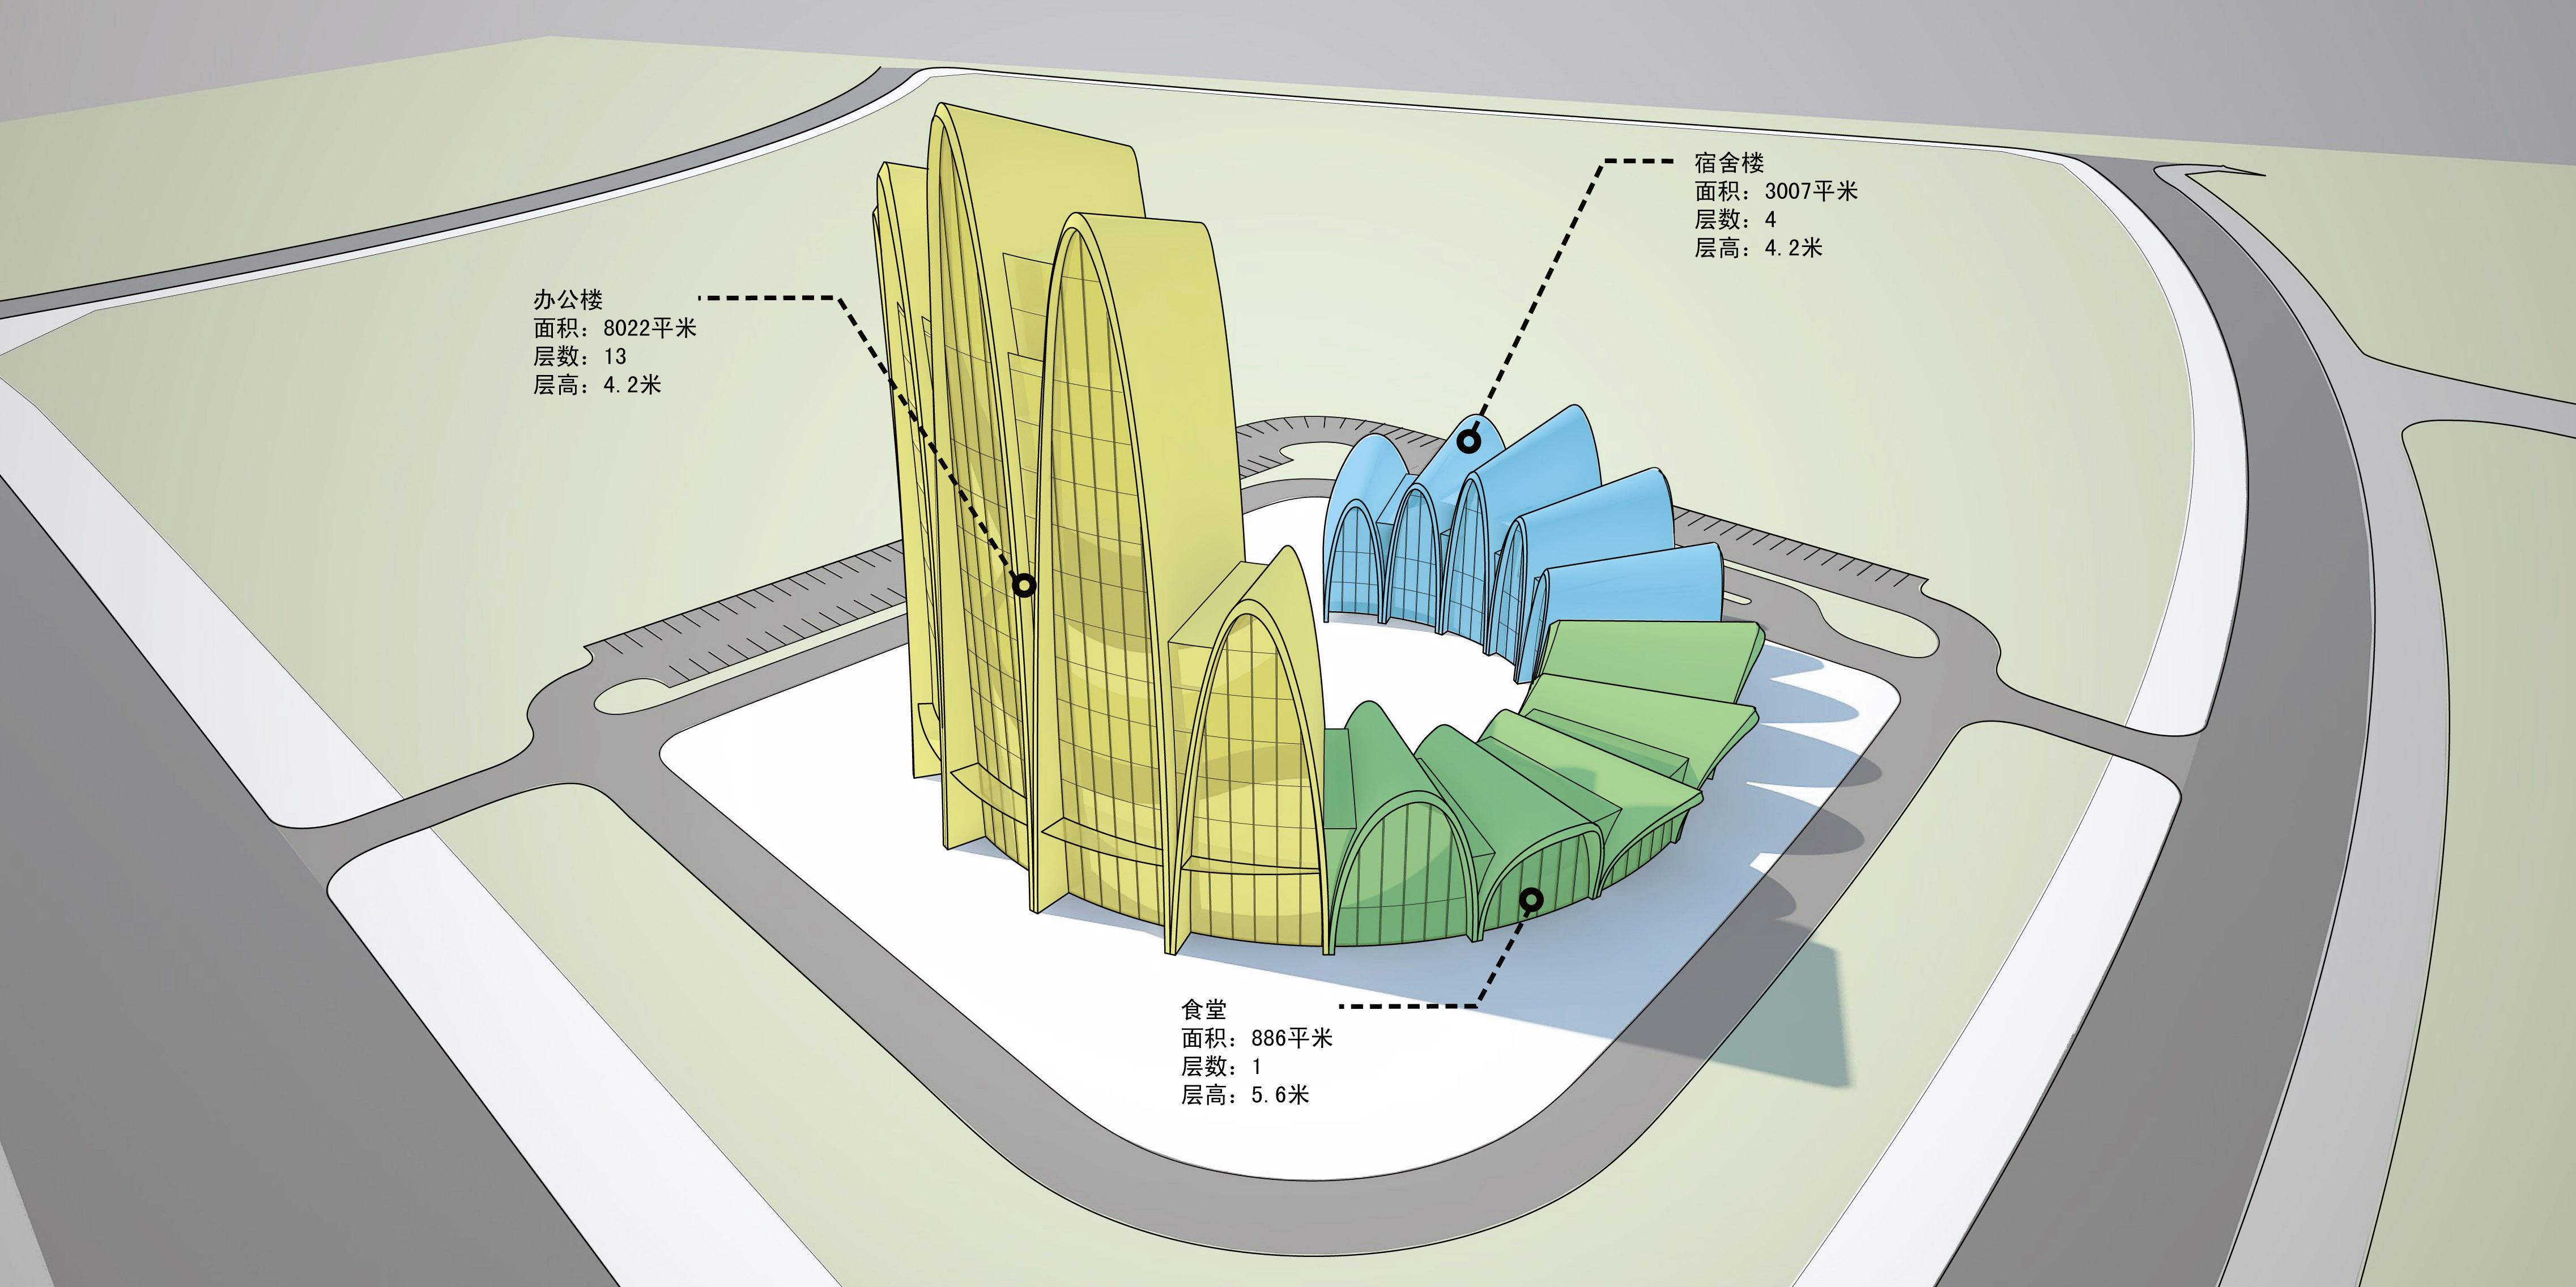 Xuejiawan_Diagram_Program